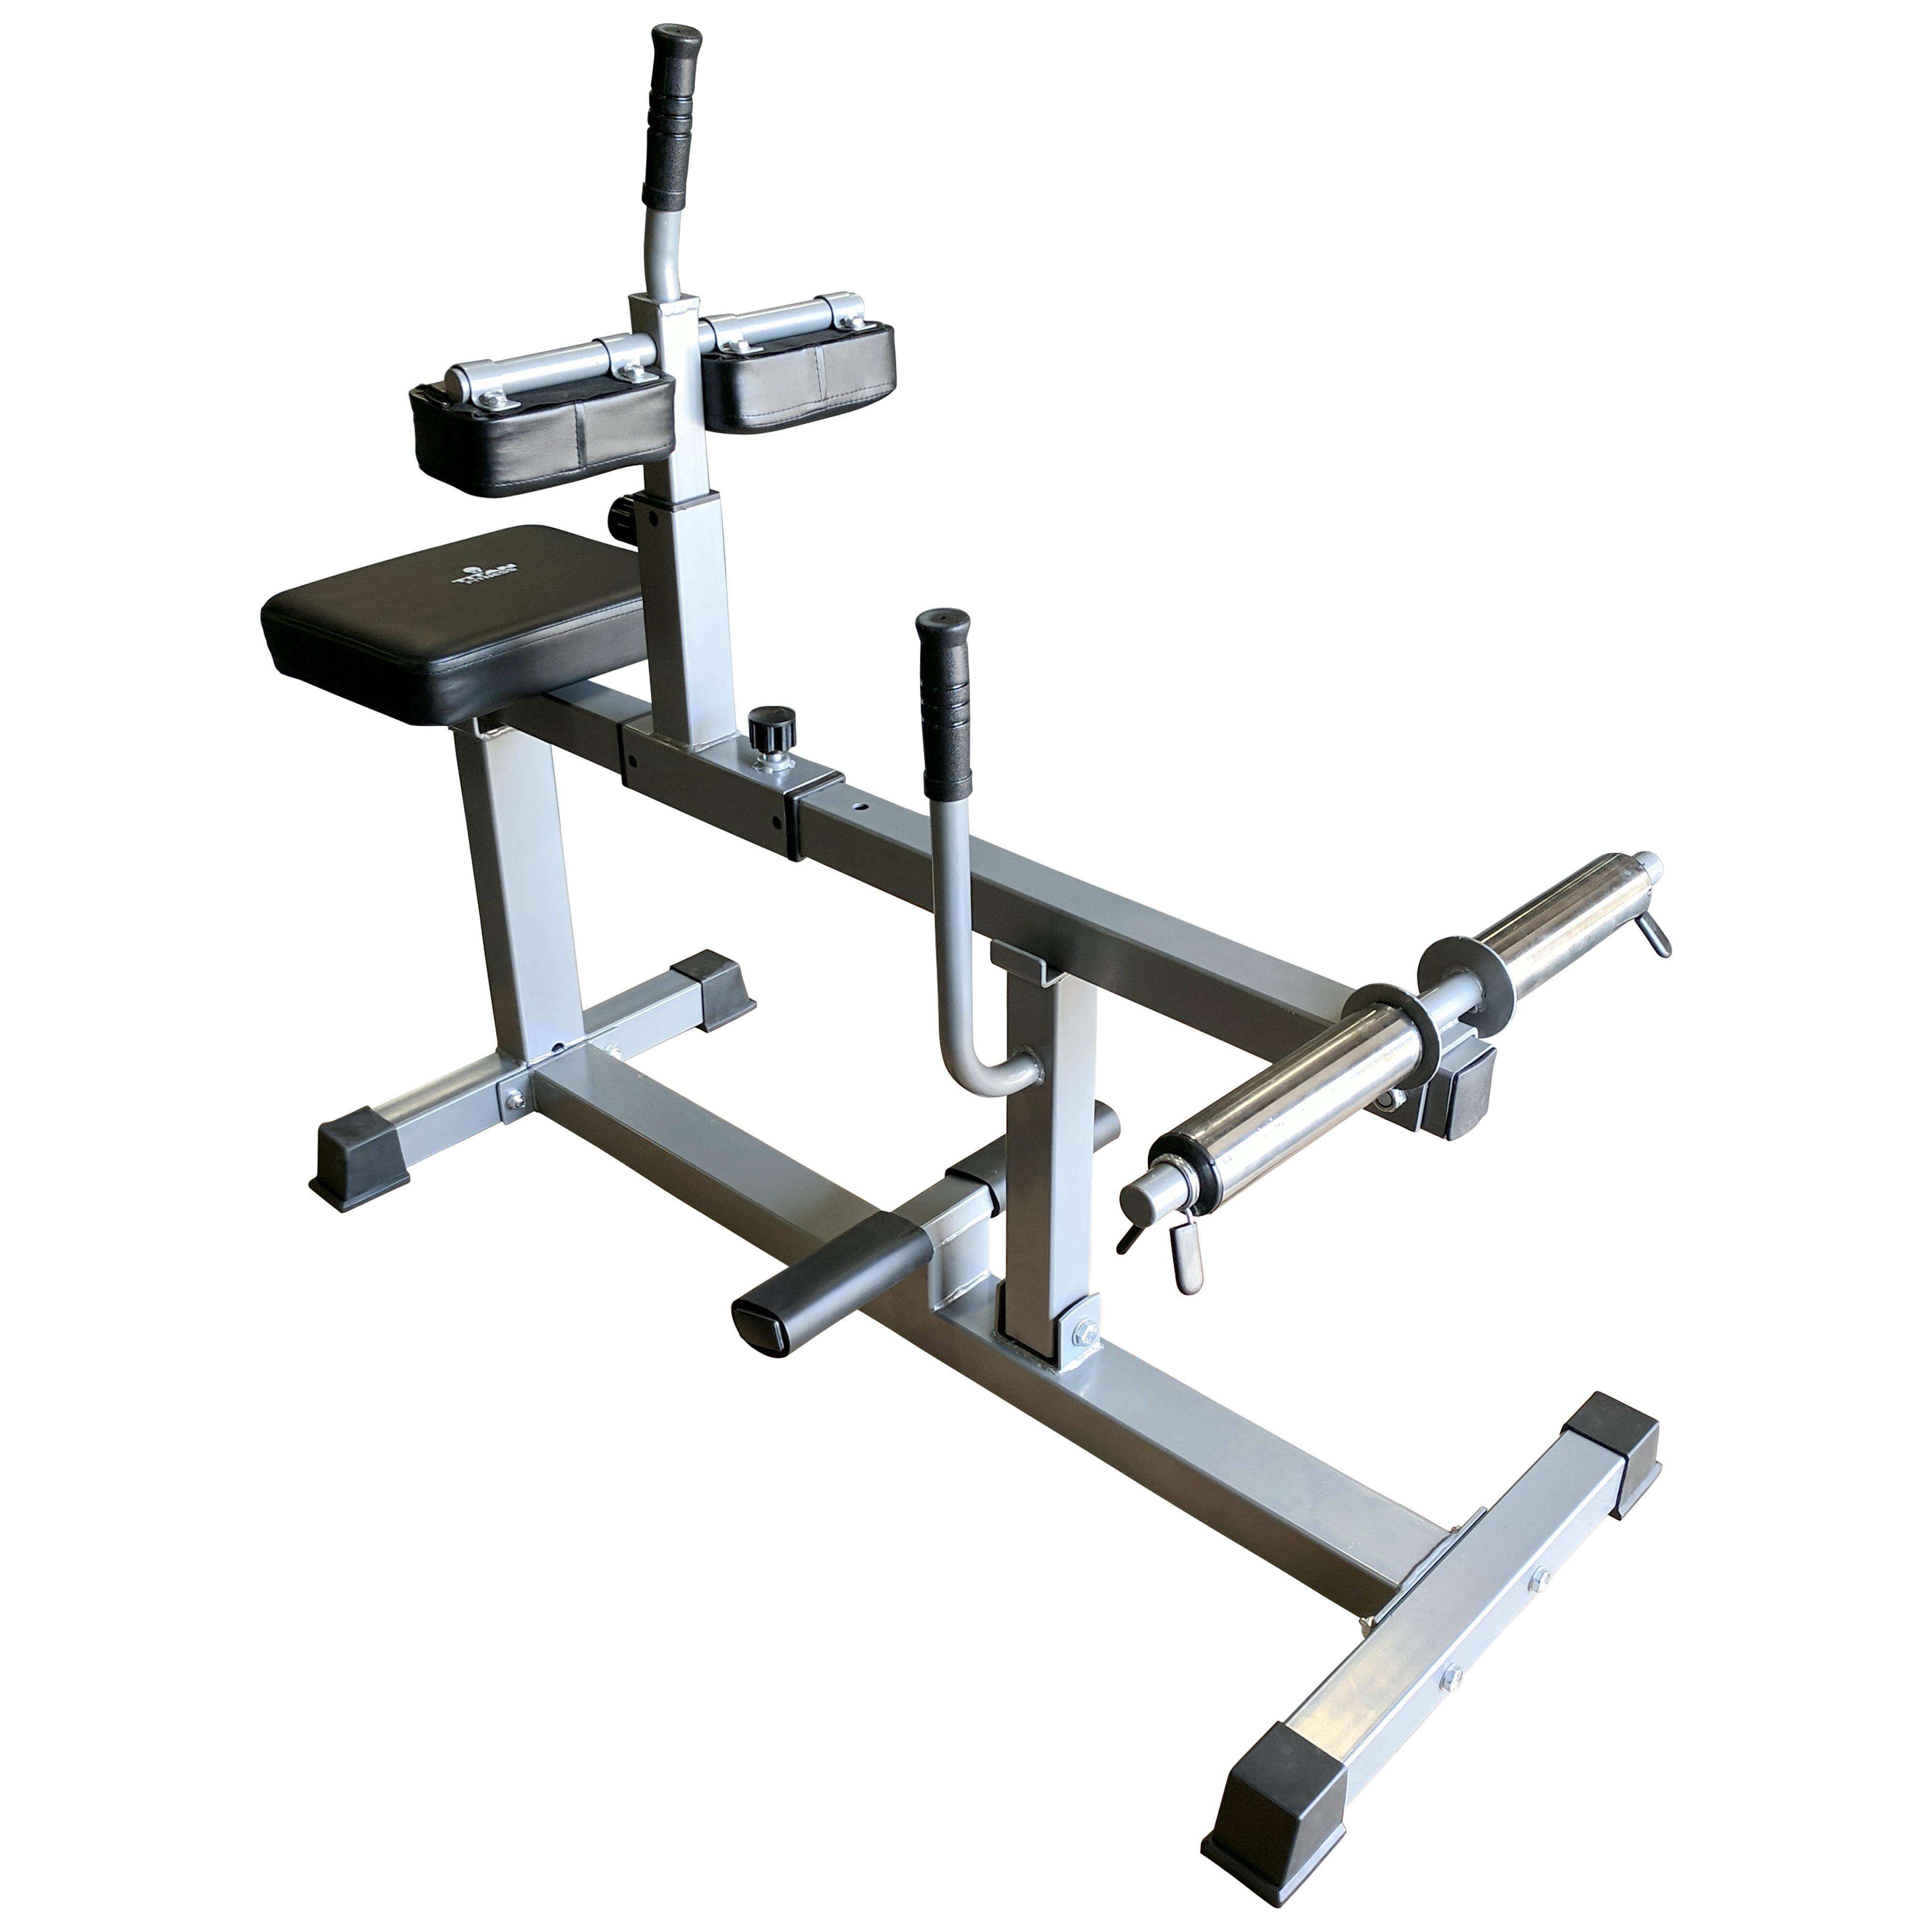 Titan Seated Calf Raise Machine Home Gym Strength Training Equipment by Titan Fitness